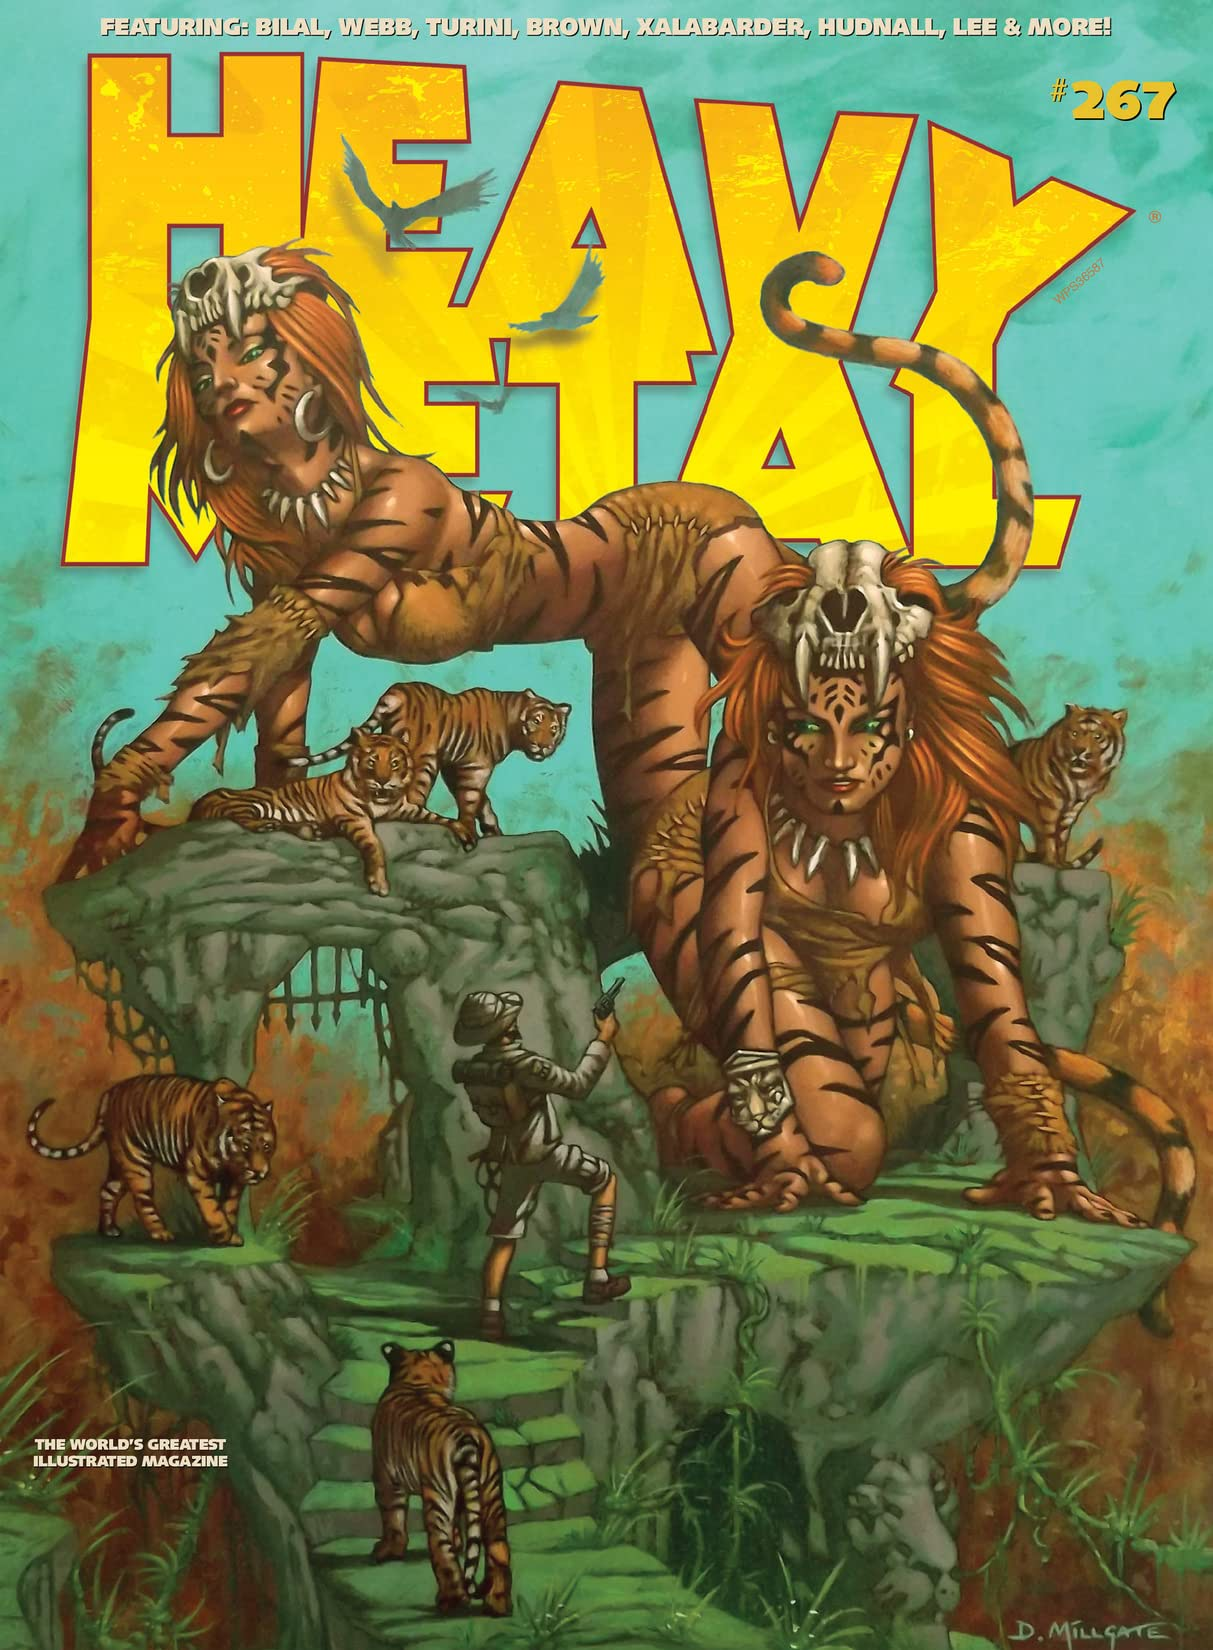 Heavy Metal #267